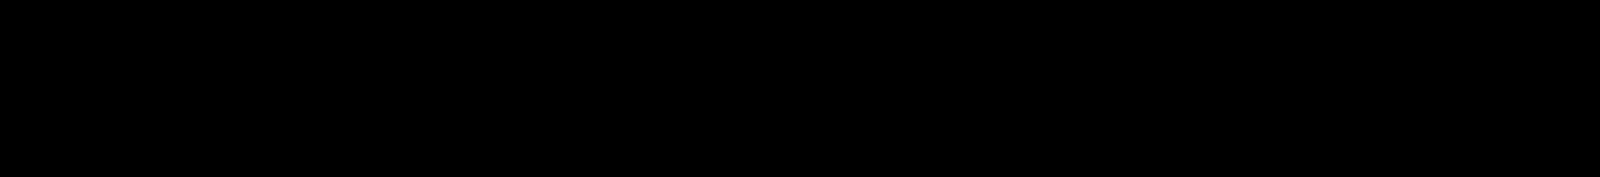 Multilaser logo.